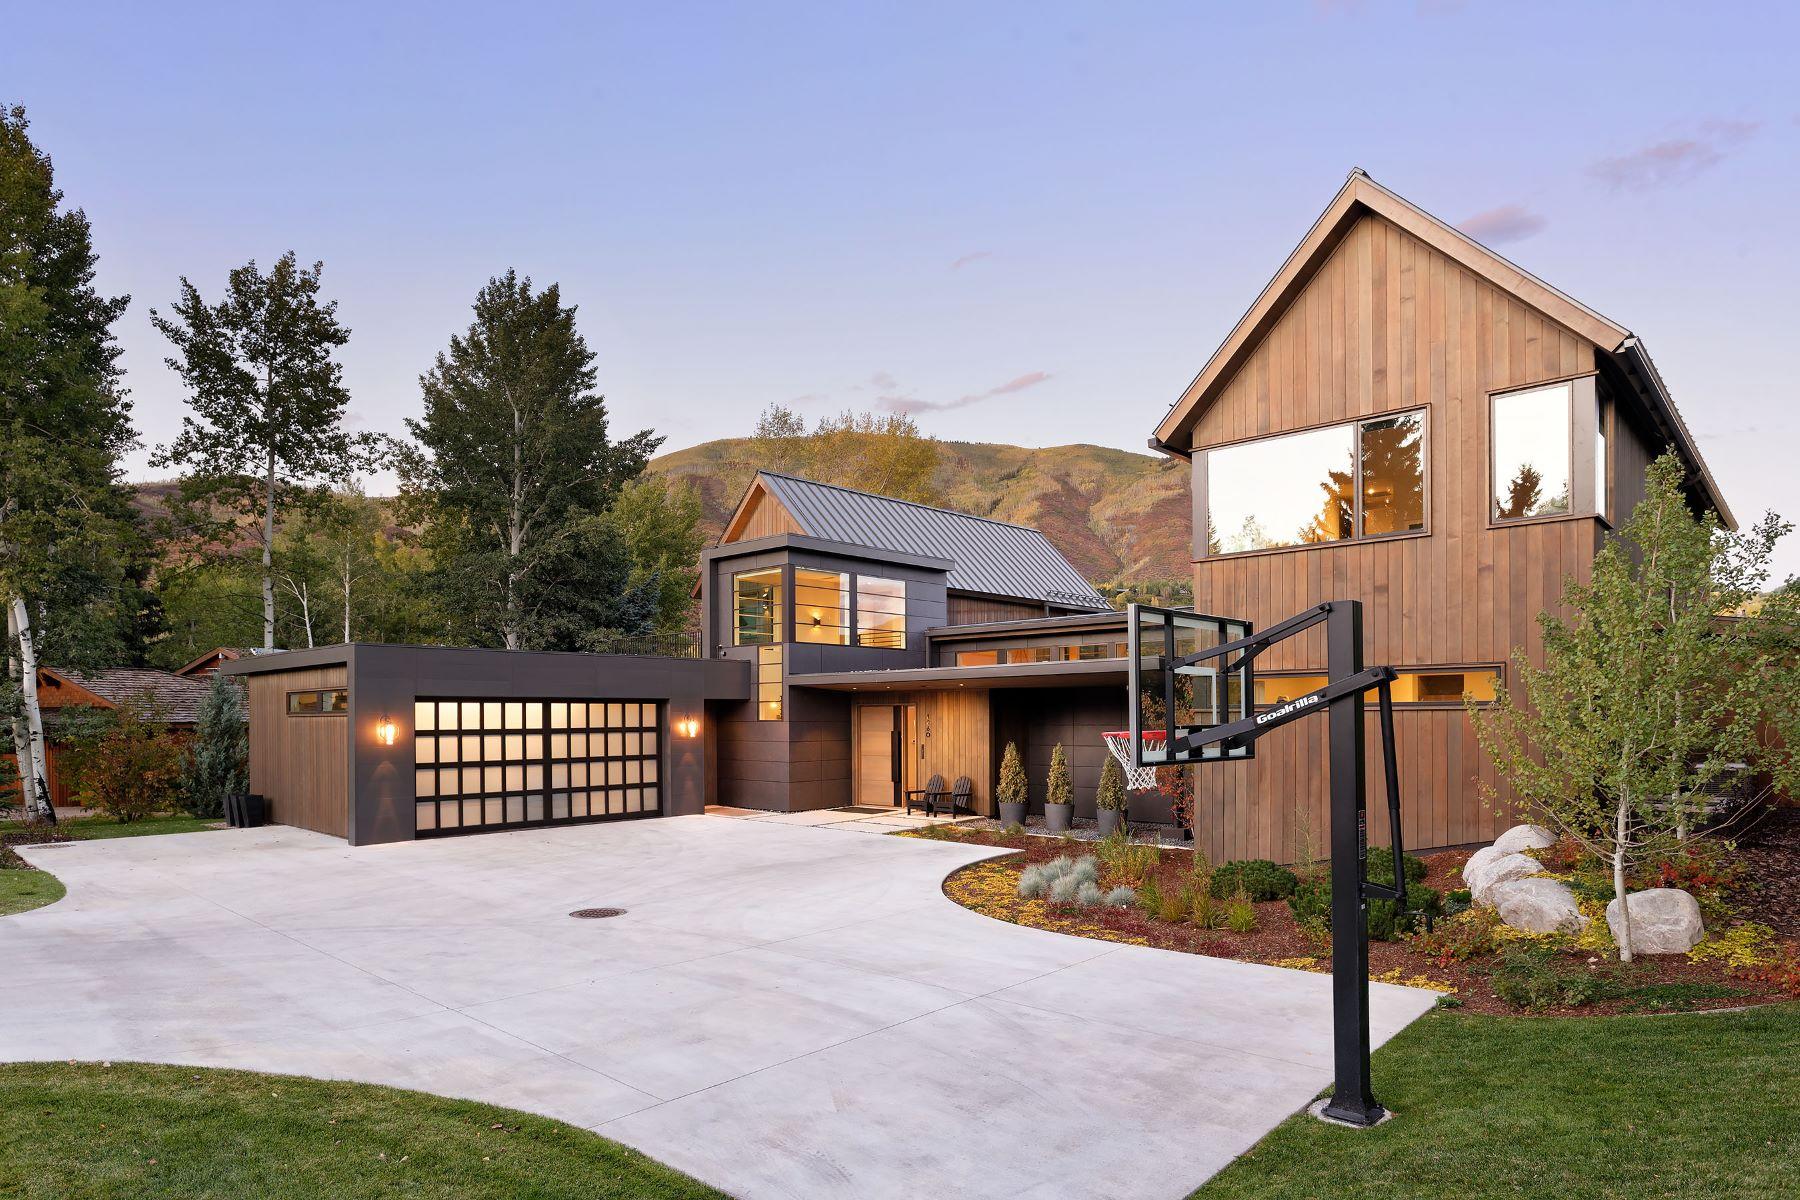 Additional photo for property listing at Modern Elegance on Snowbunny 1260 Snowbunny Lane Aspen, Colorado 81611 Estados Unidos